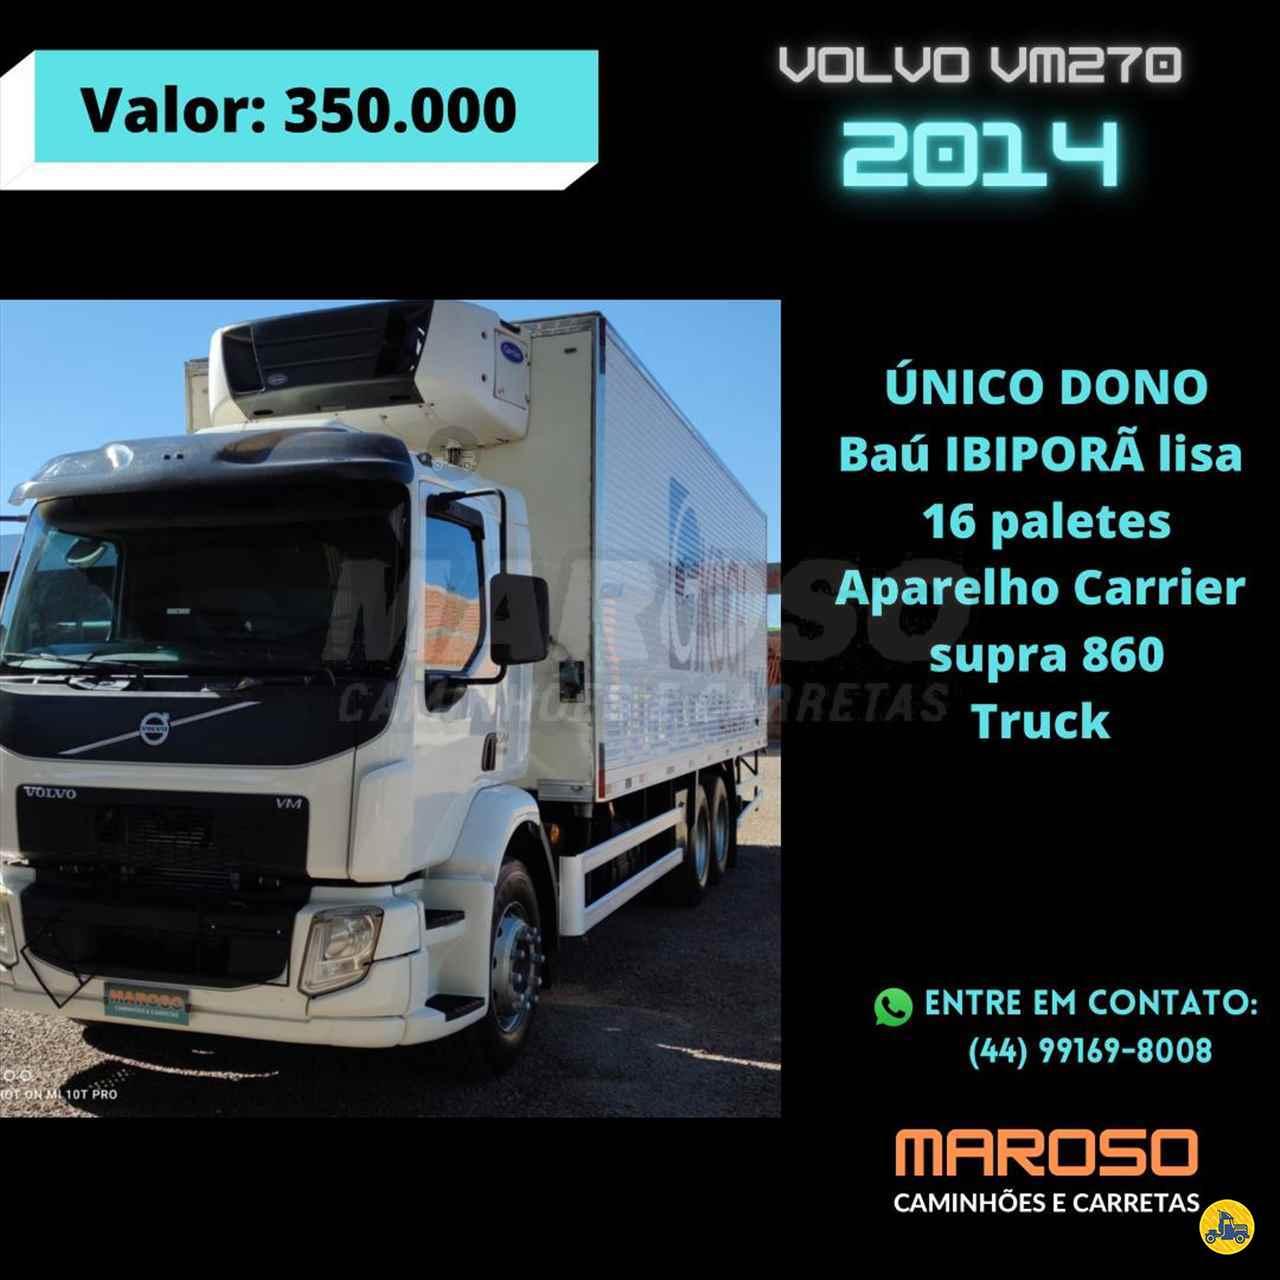 VOLVO VM 270 de Maroso Caminhões - PALOTINA/PR